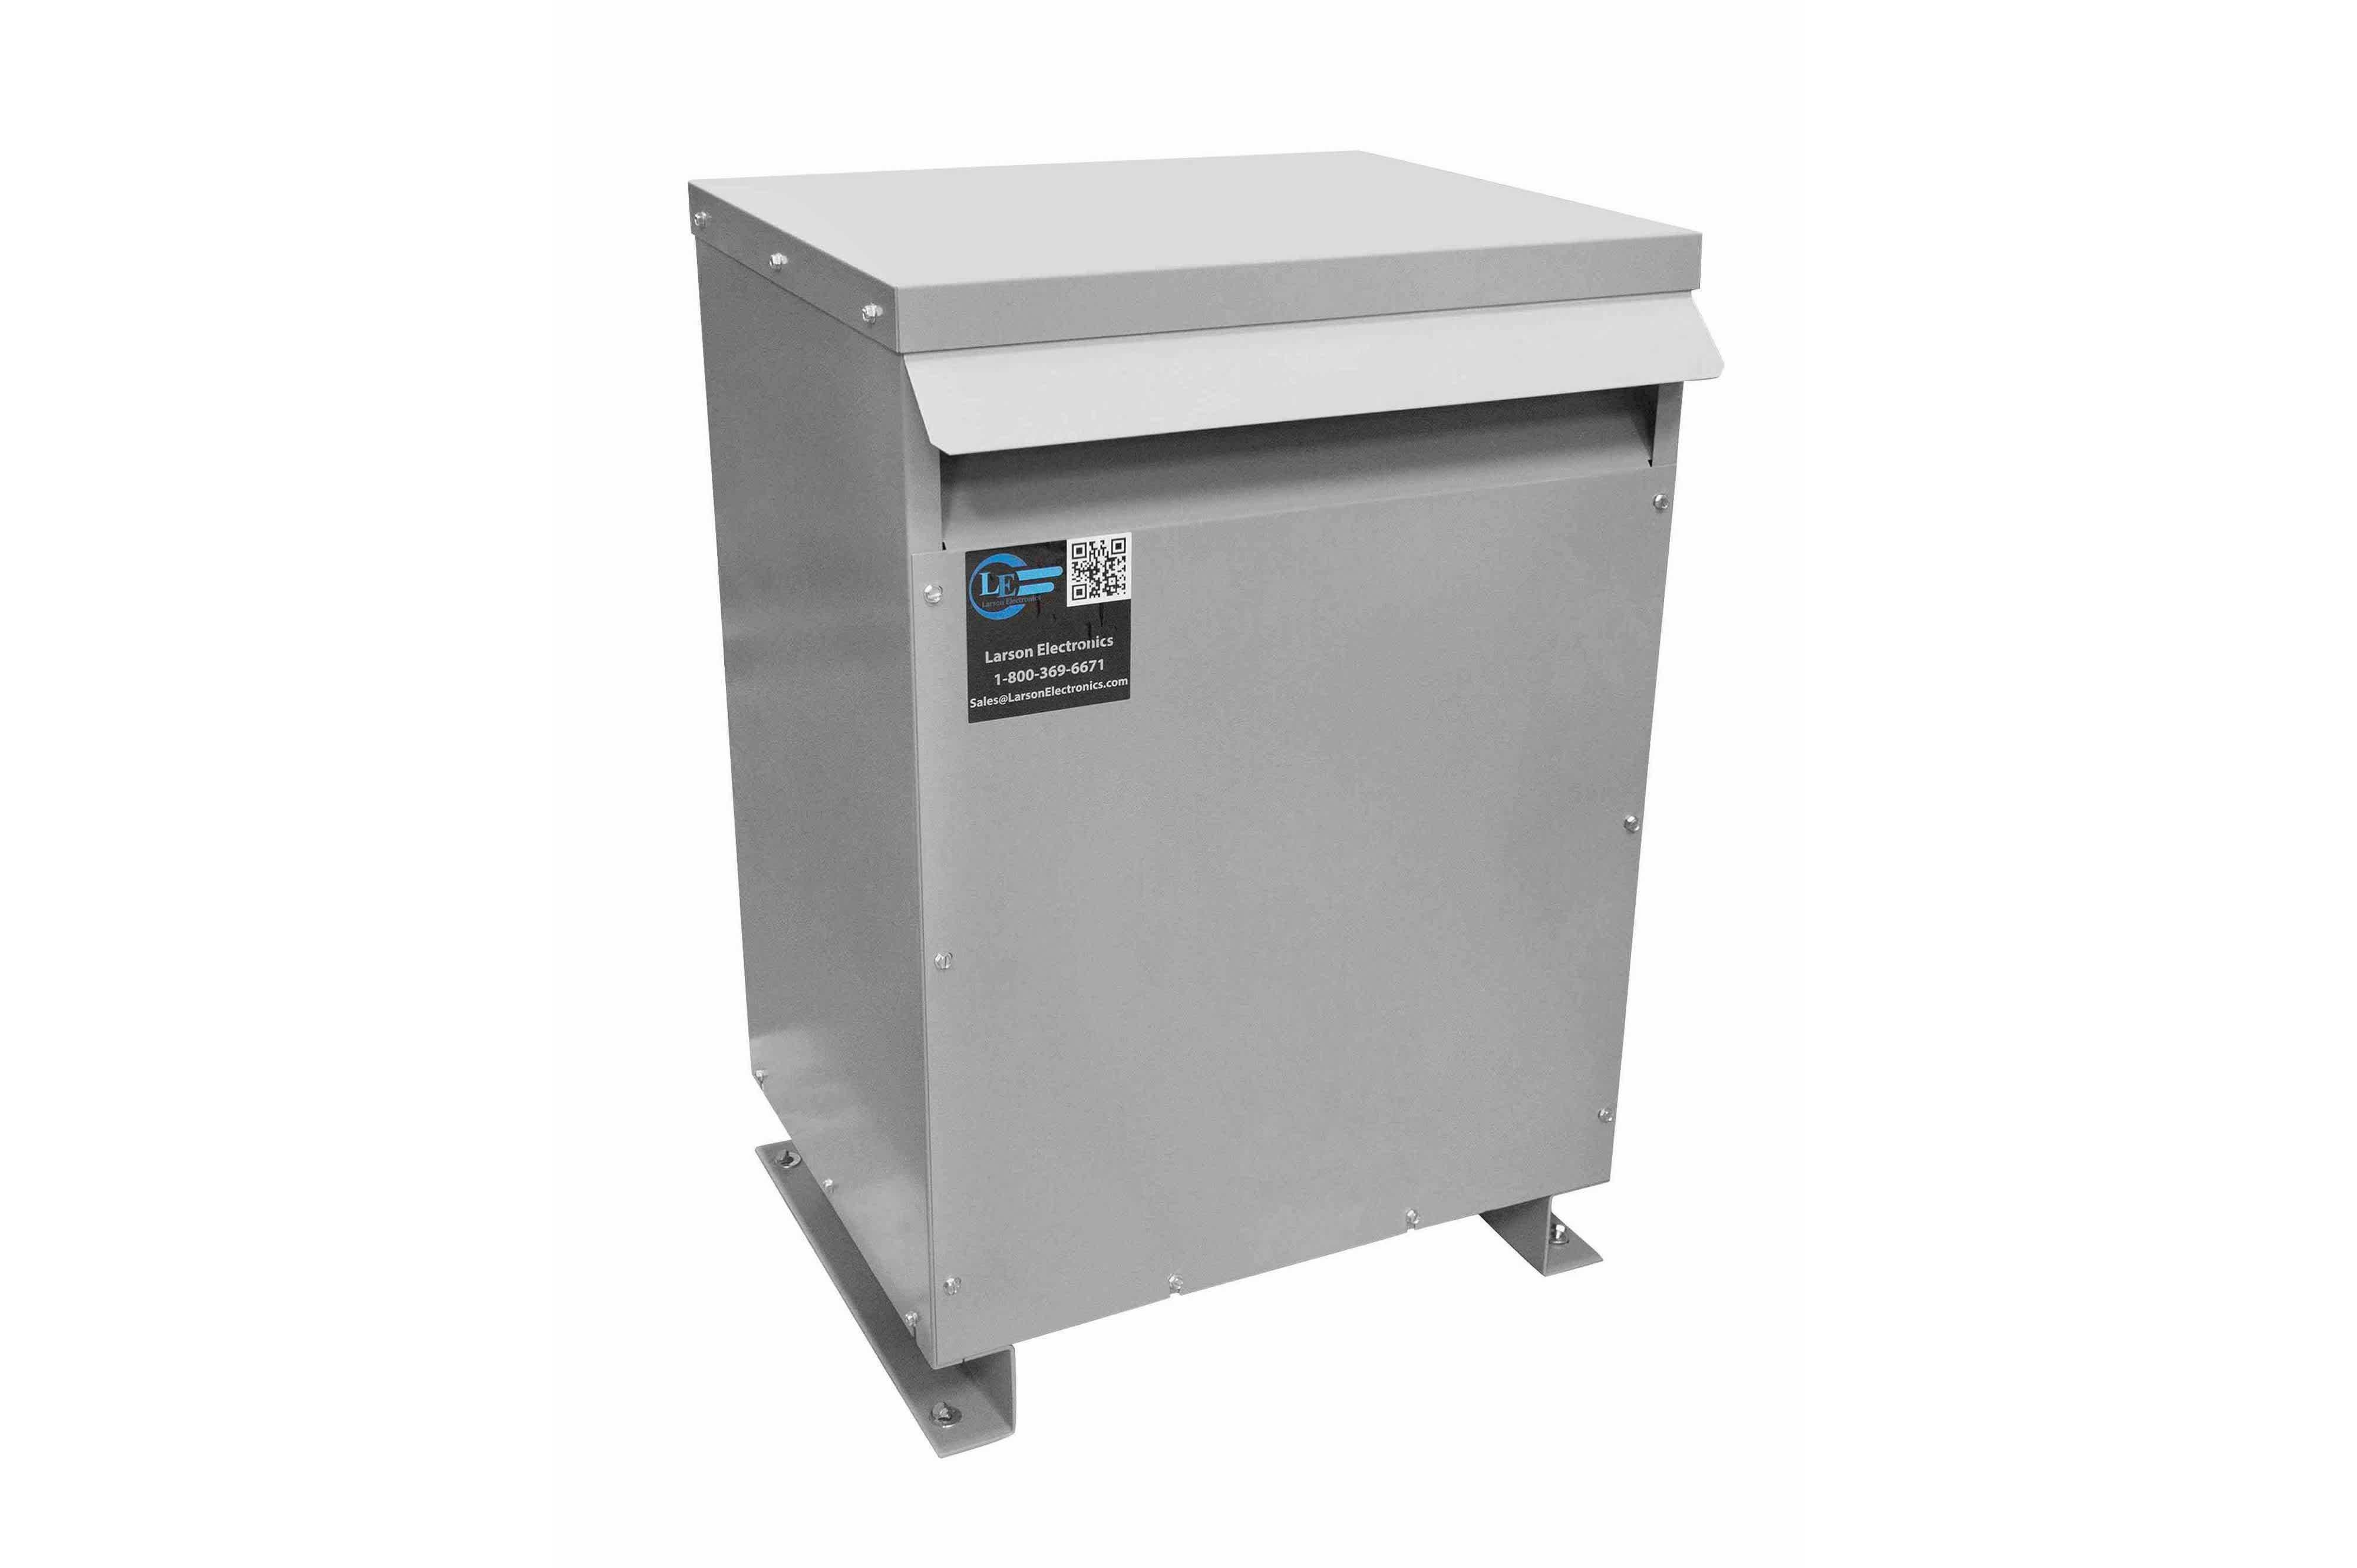 32.5 kVA 3PH Isolation Transformer, 600V Wye Primary, 415V Delta Secondary, N3R, Ventilated, 60 Hz